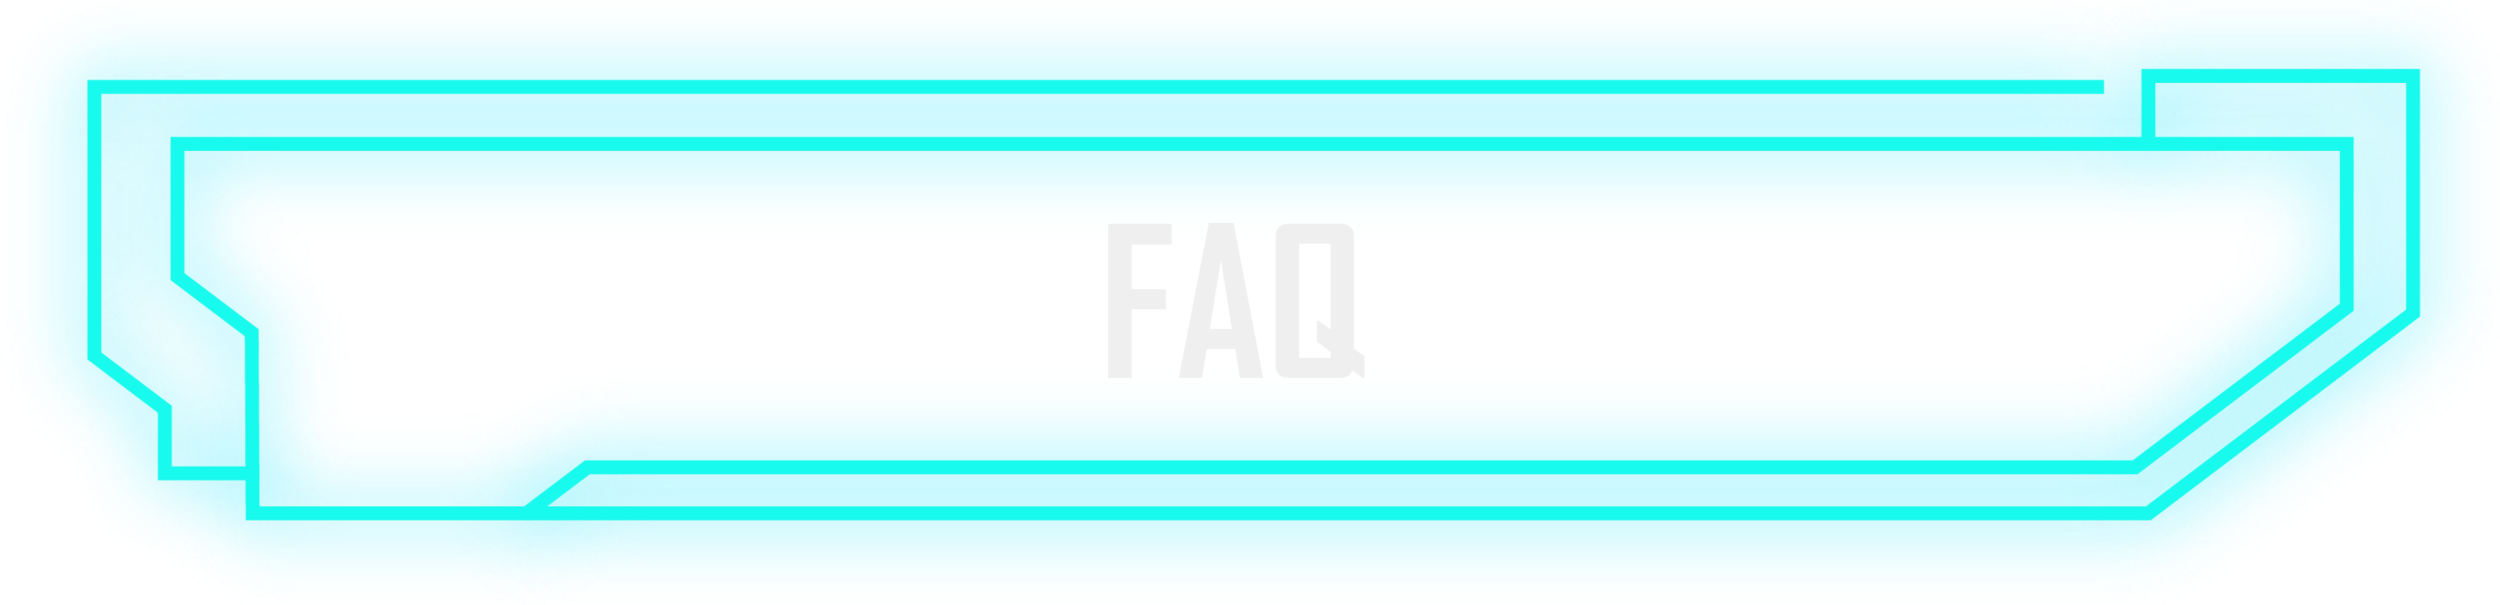 FAQ-06.png